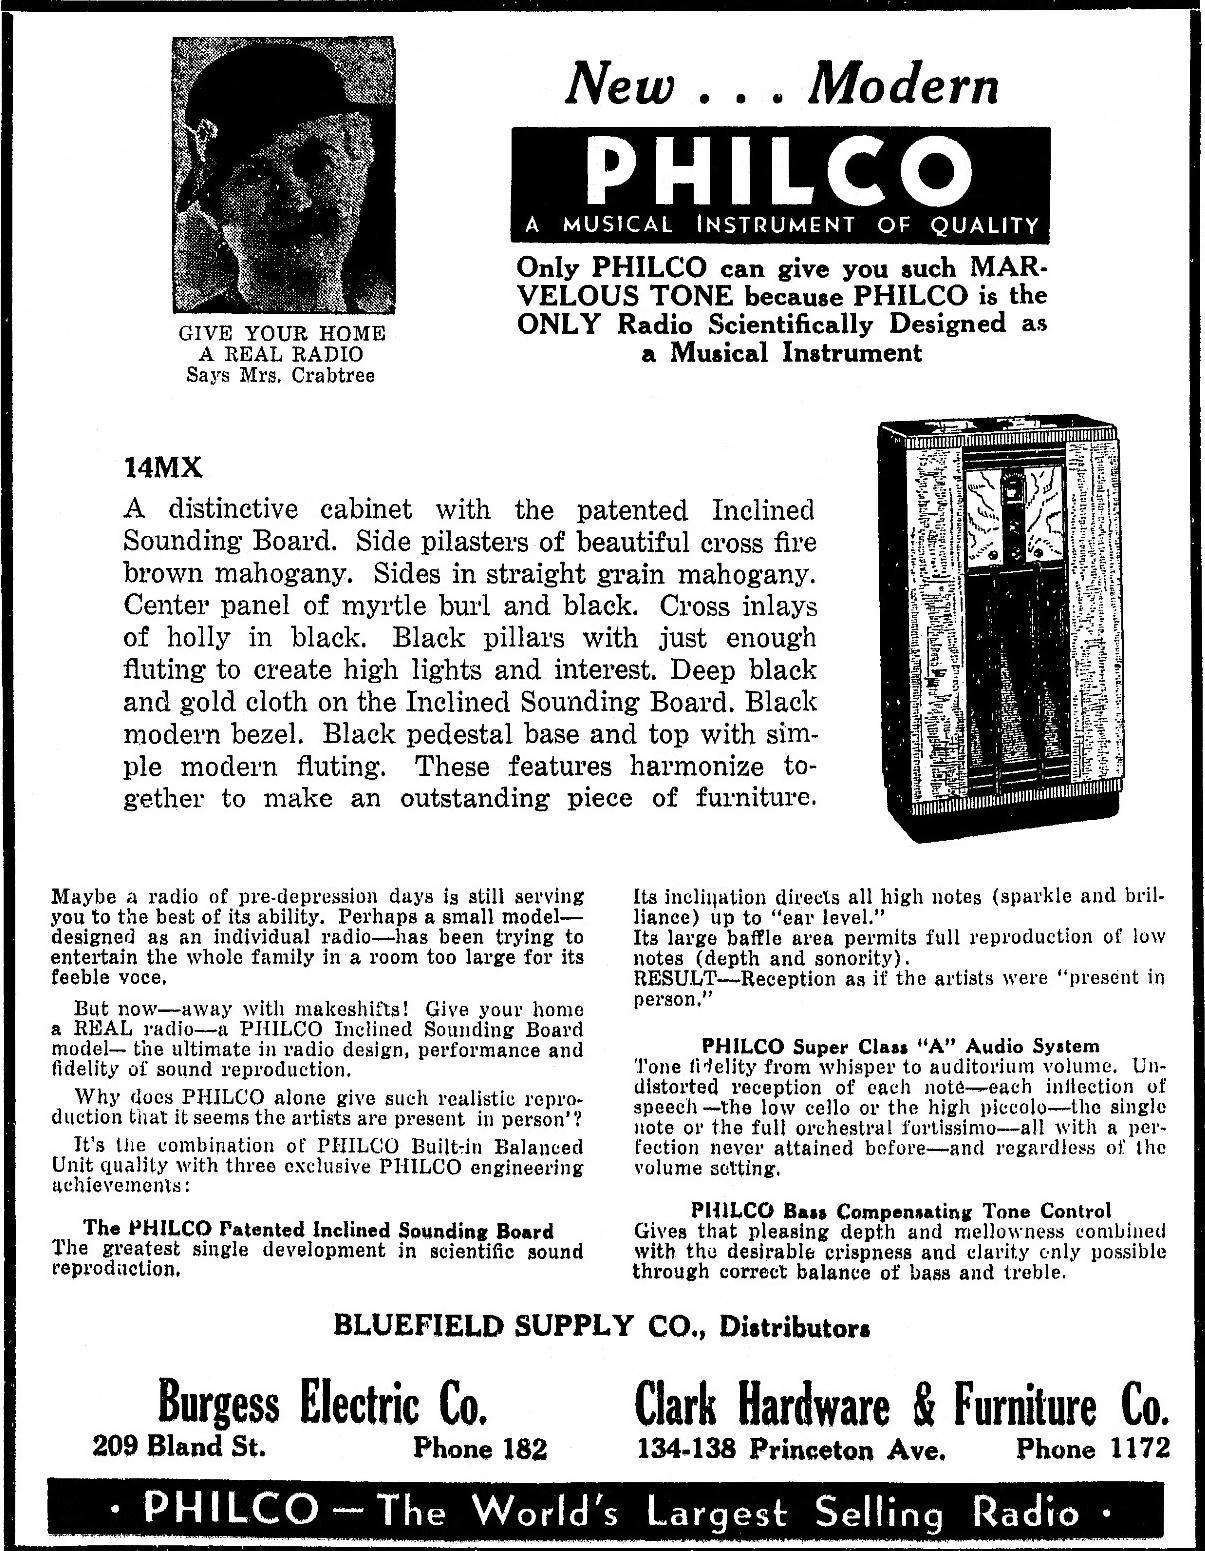 Philco Model 14MX Console Radio (January 1934)